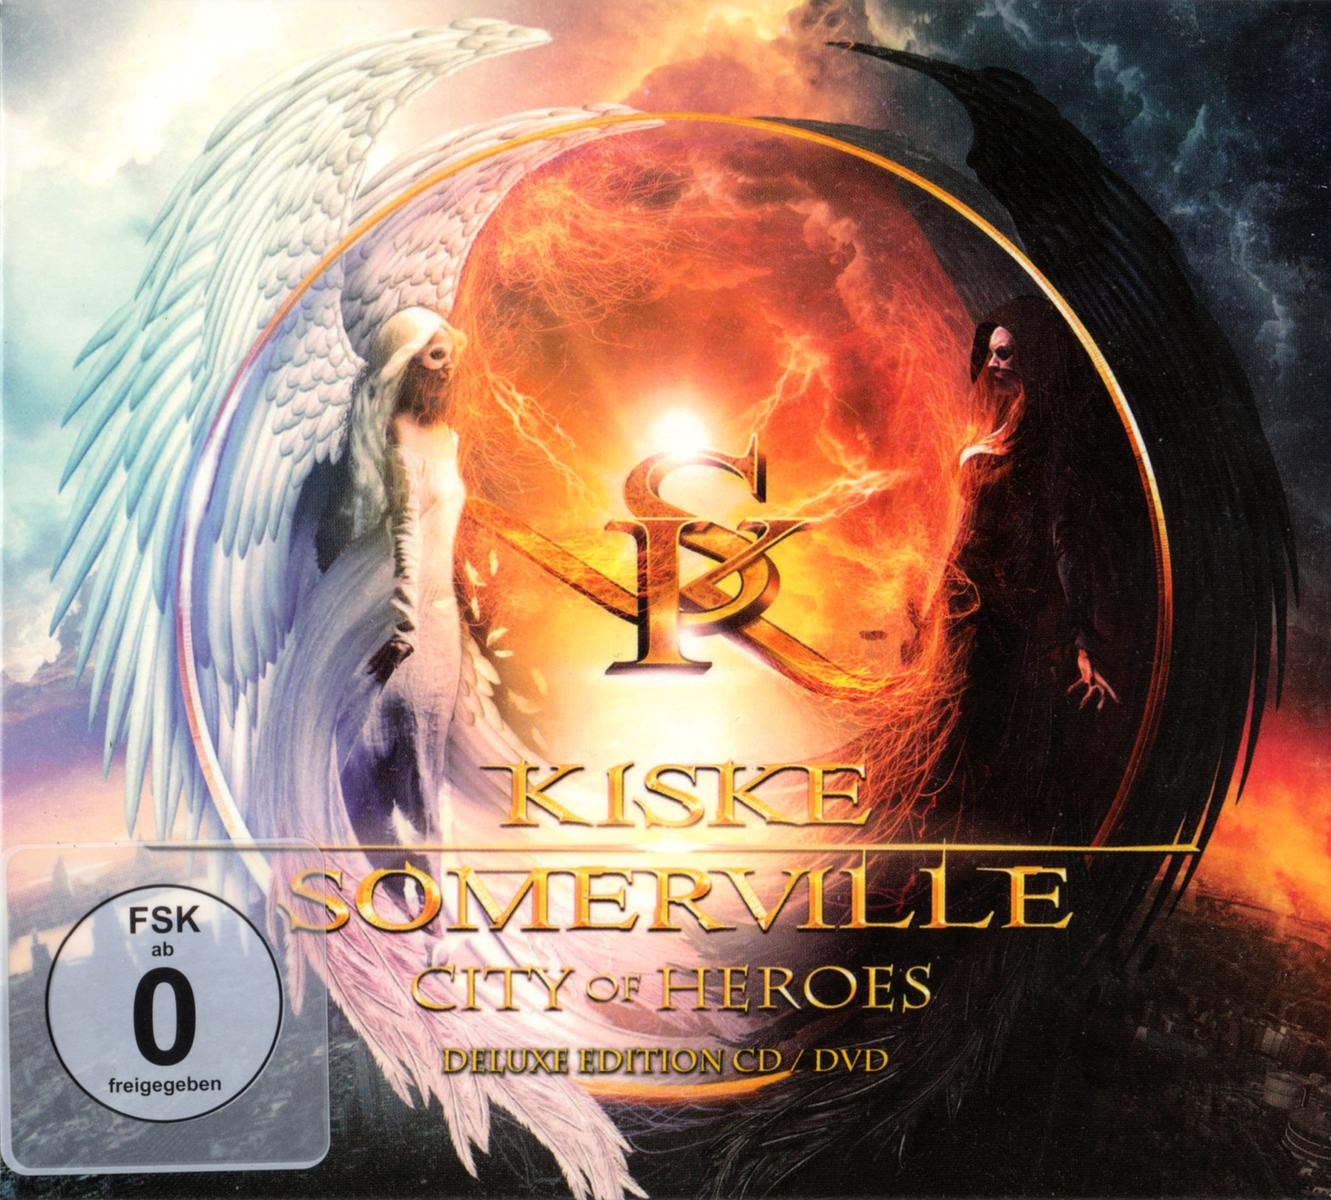 Kiske / Somerville - City of Heroes